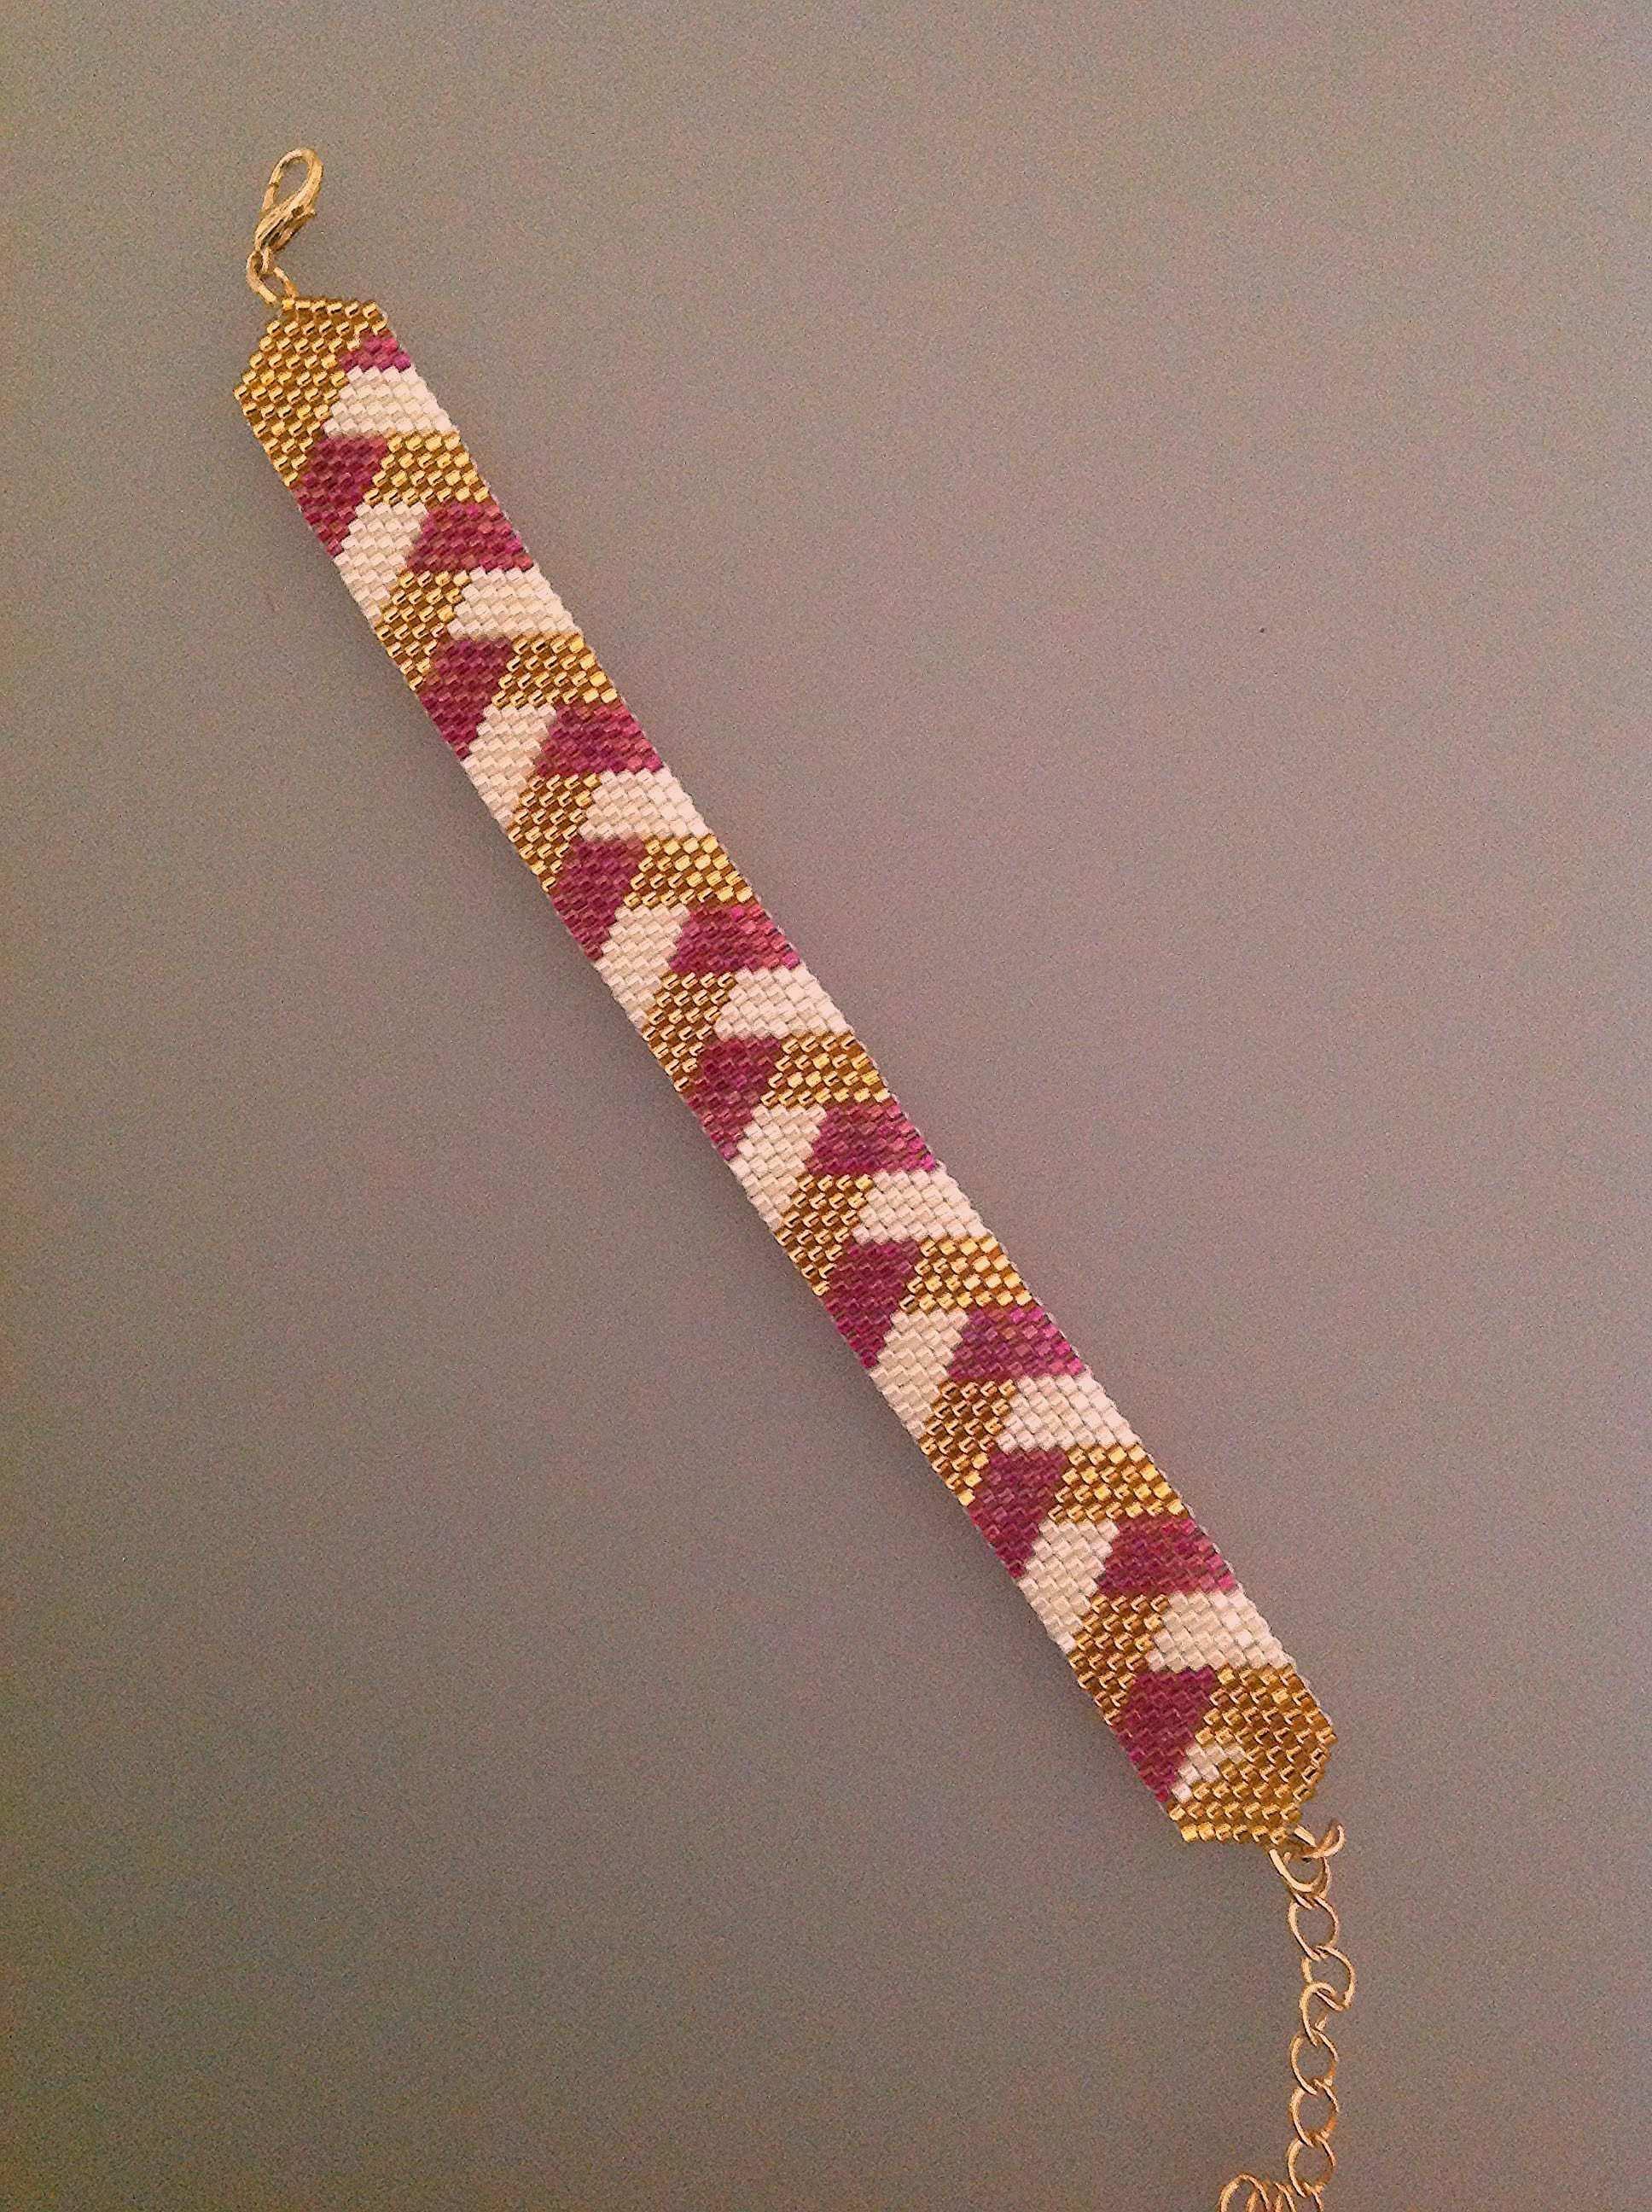 Armband Weben Muster Armband Weben Gewebte Armbander Armband Muster